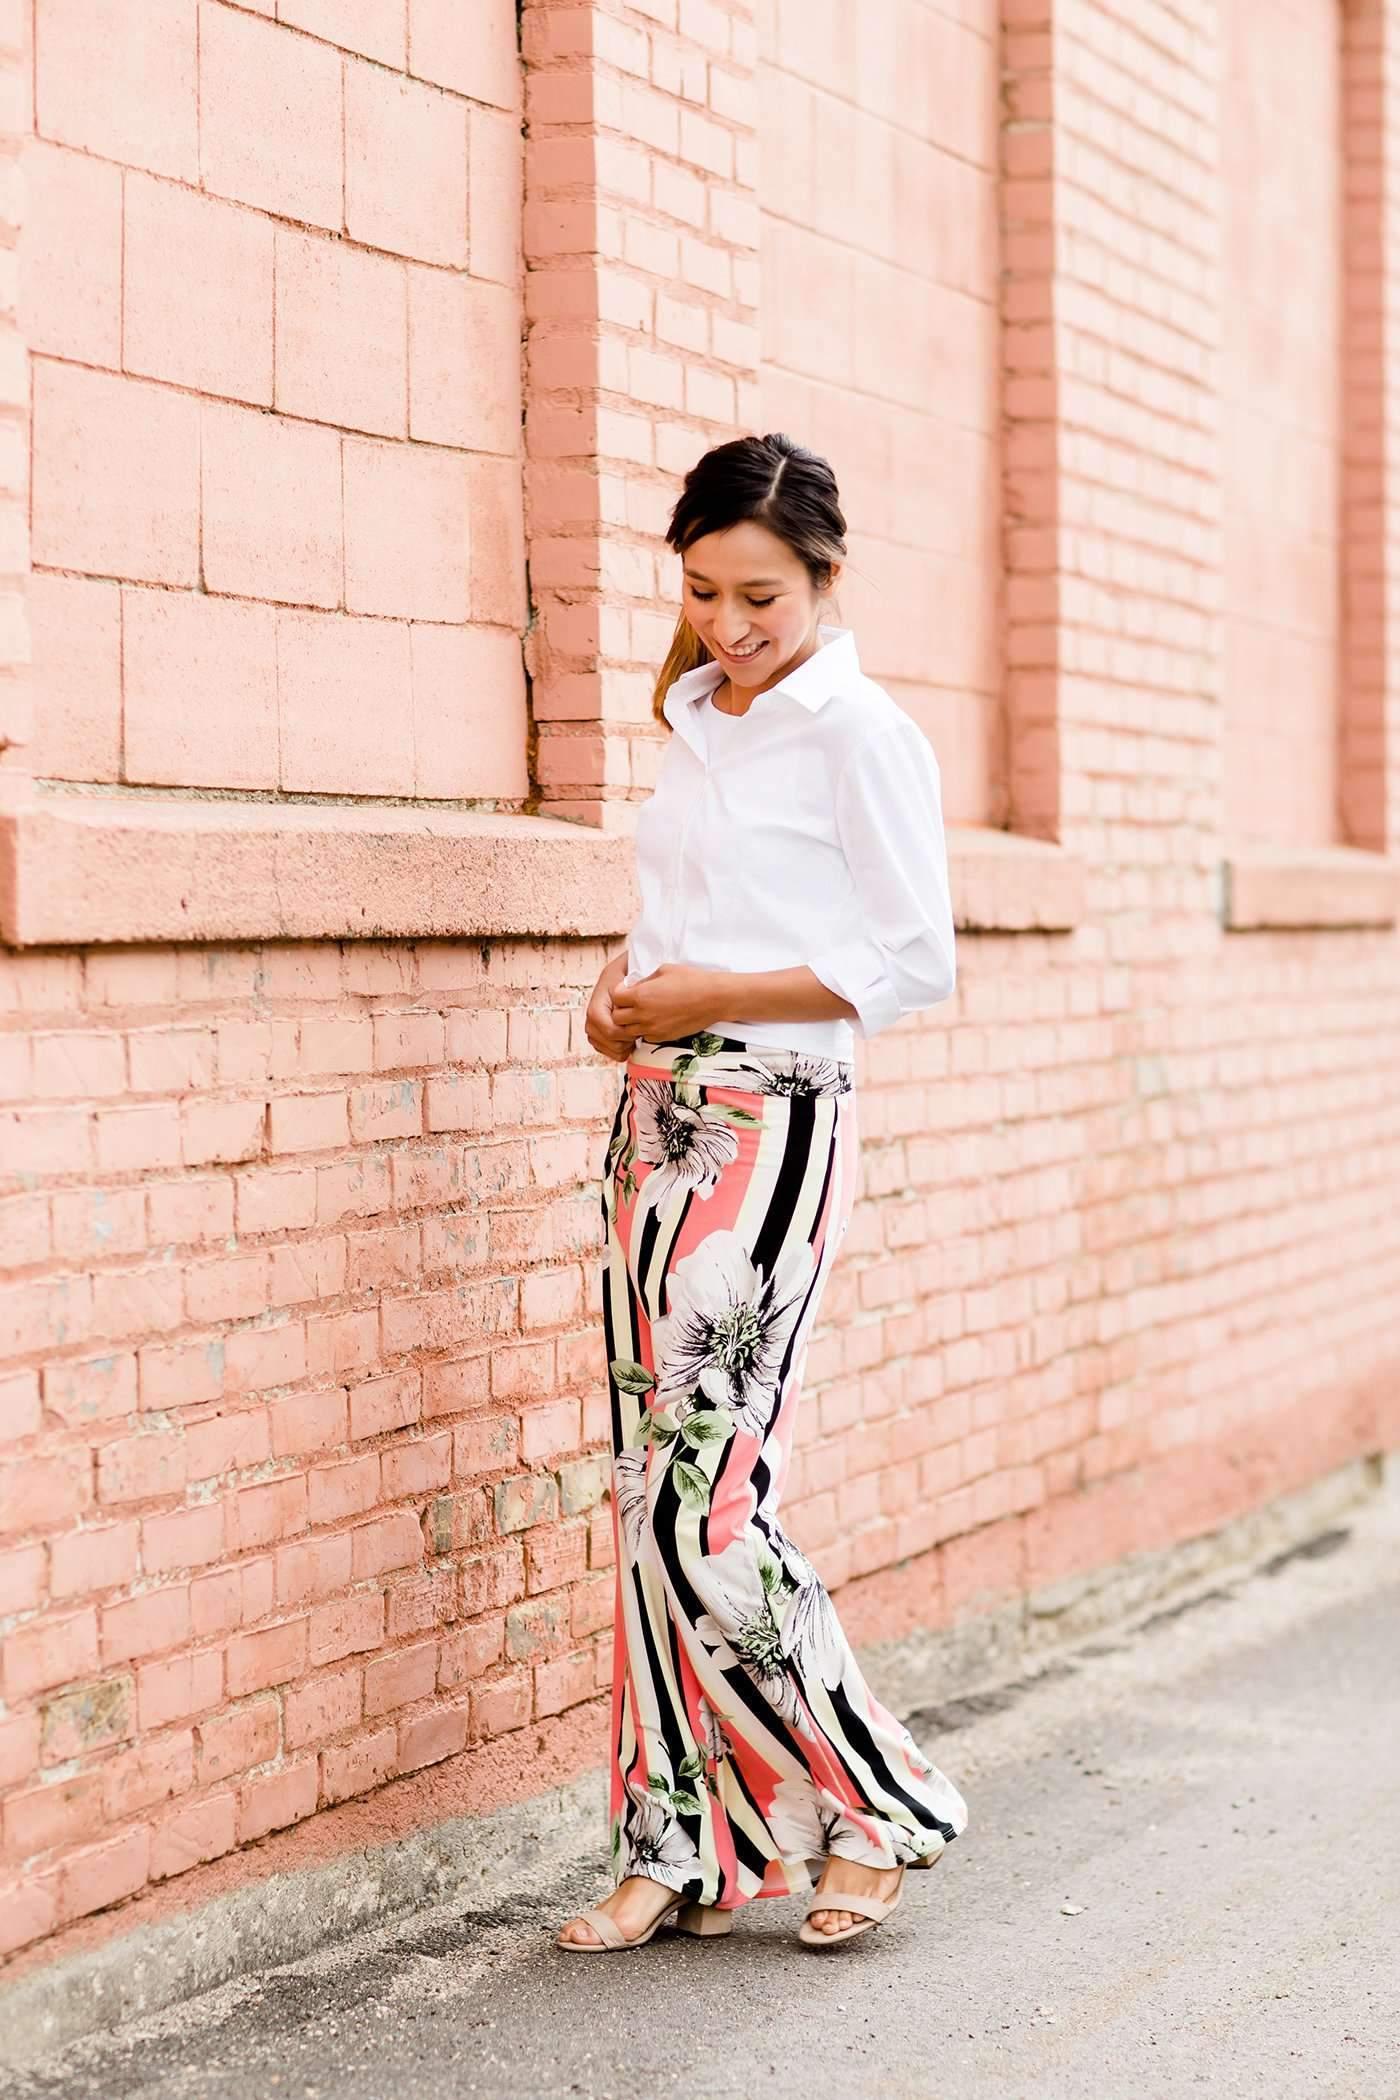 Inherit Clothing Company – Minnesota